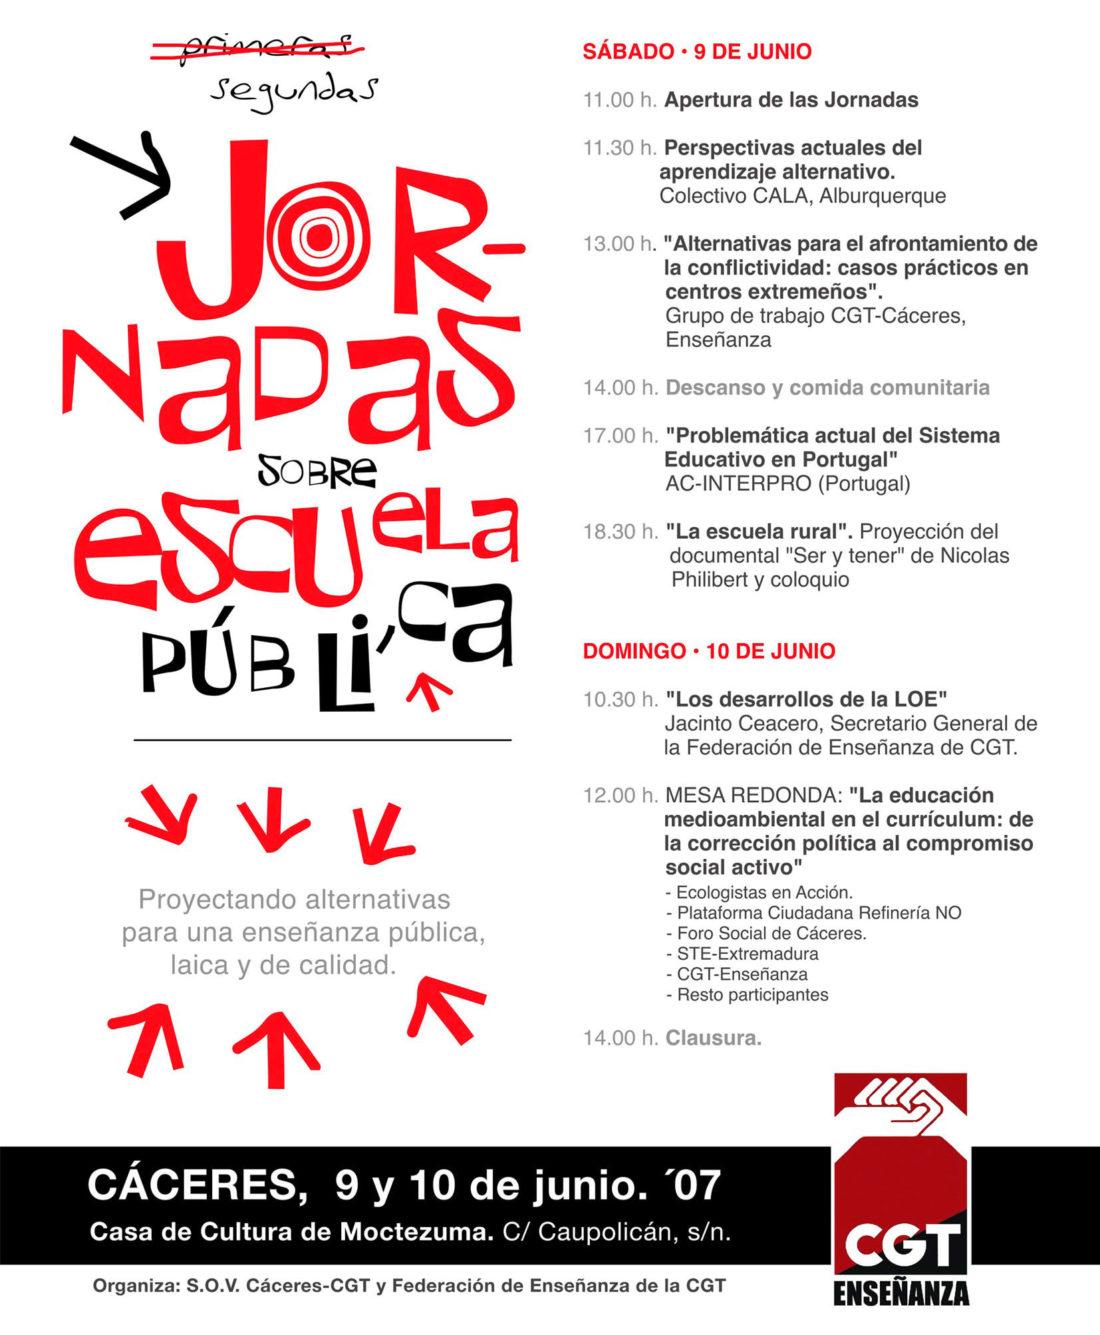 Cáceres. II Jornadas de Escuela pública